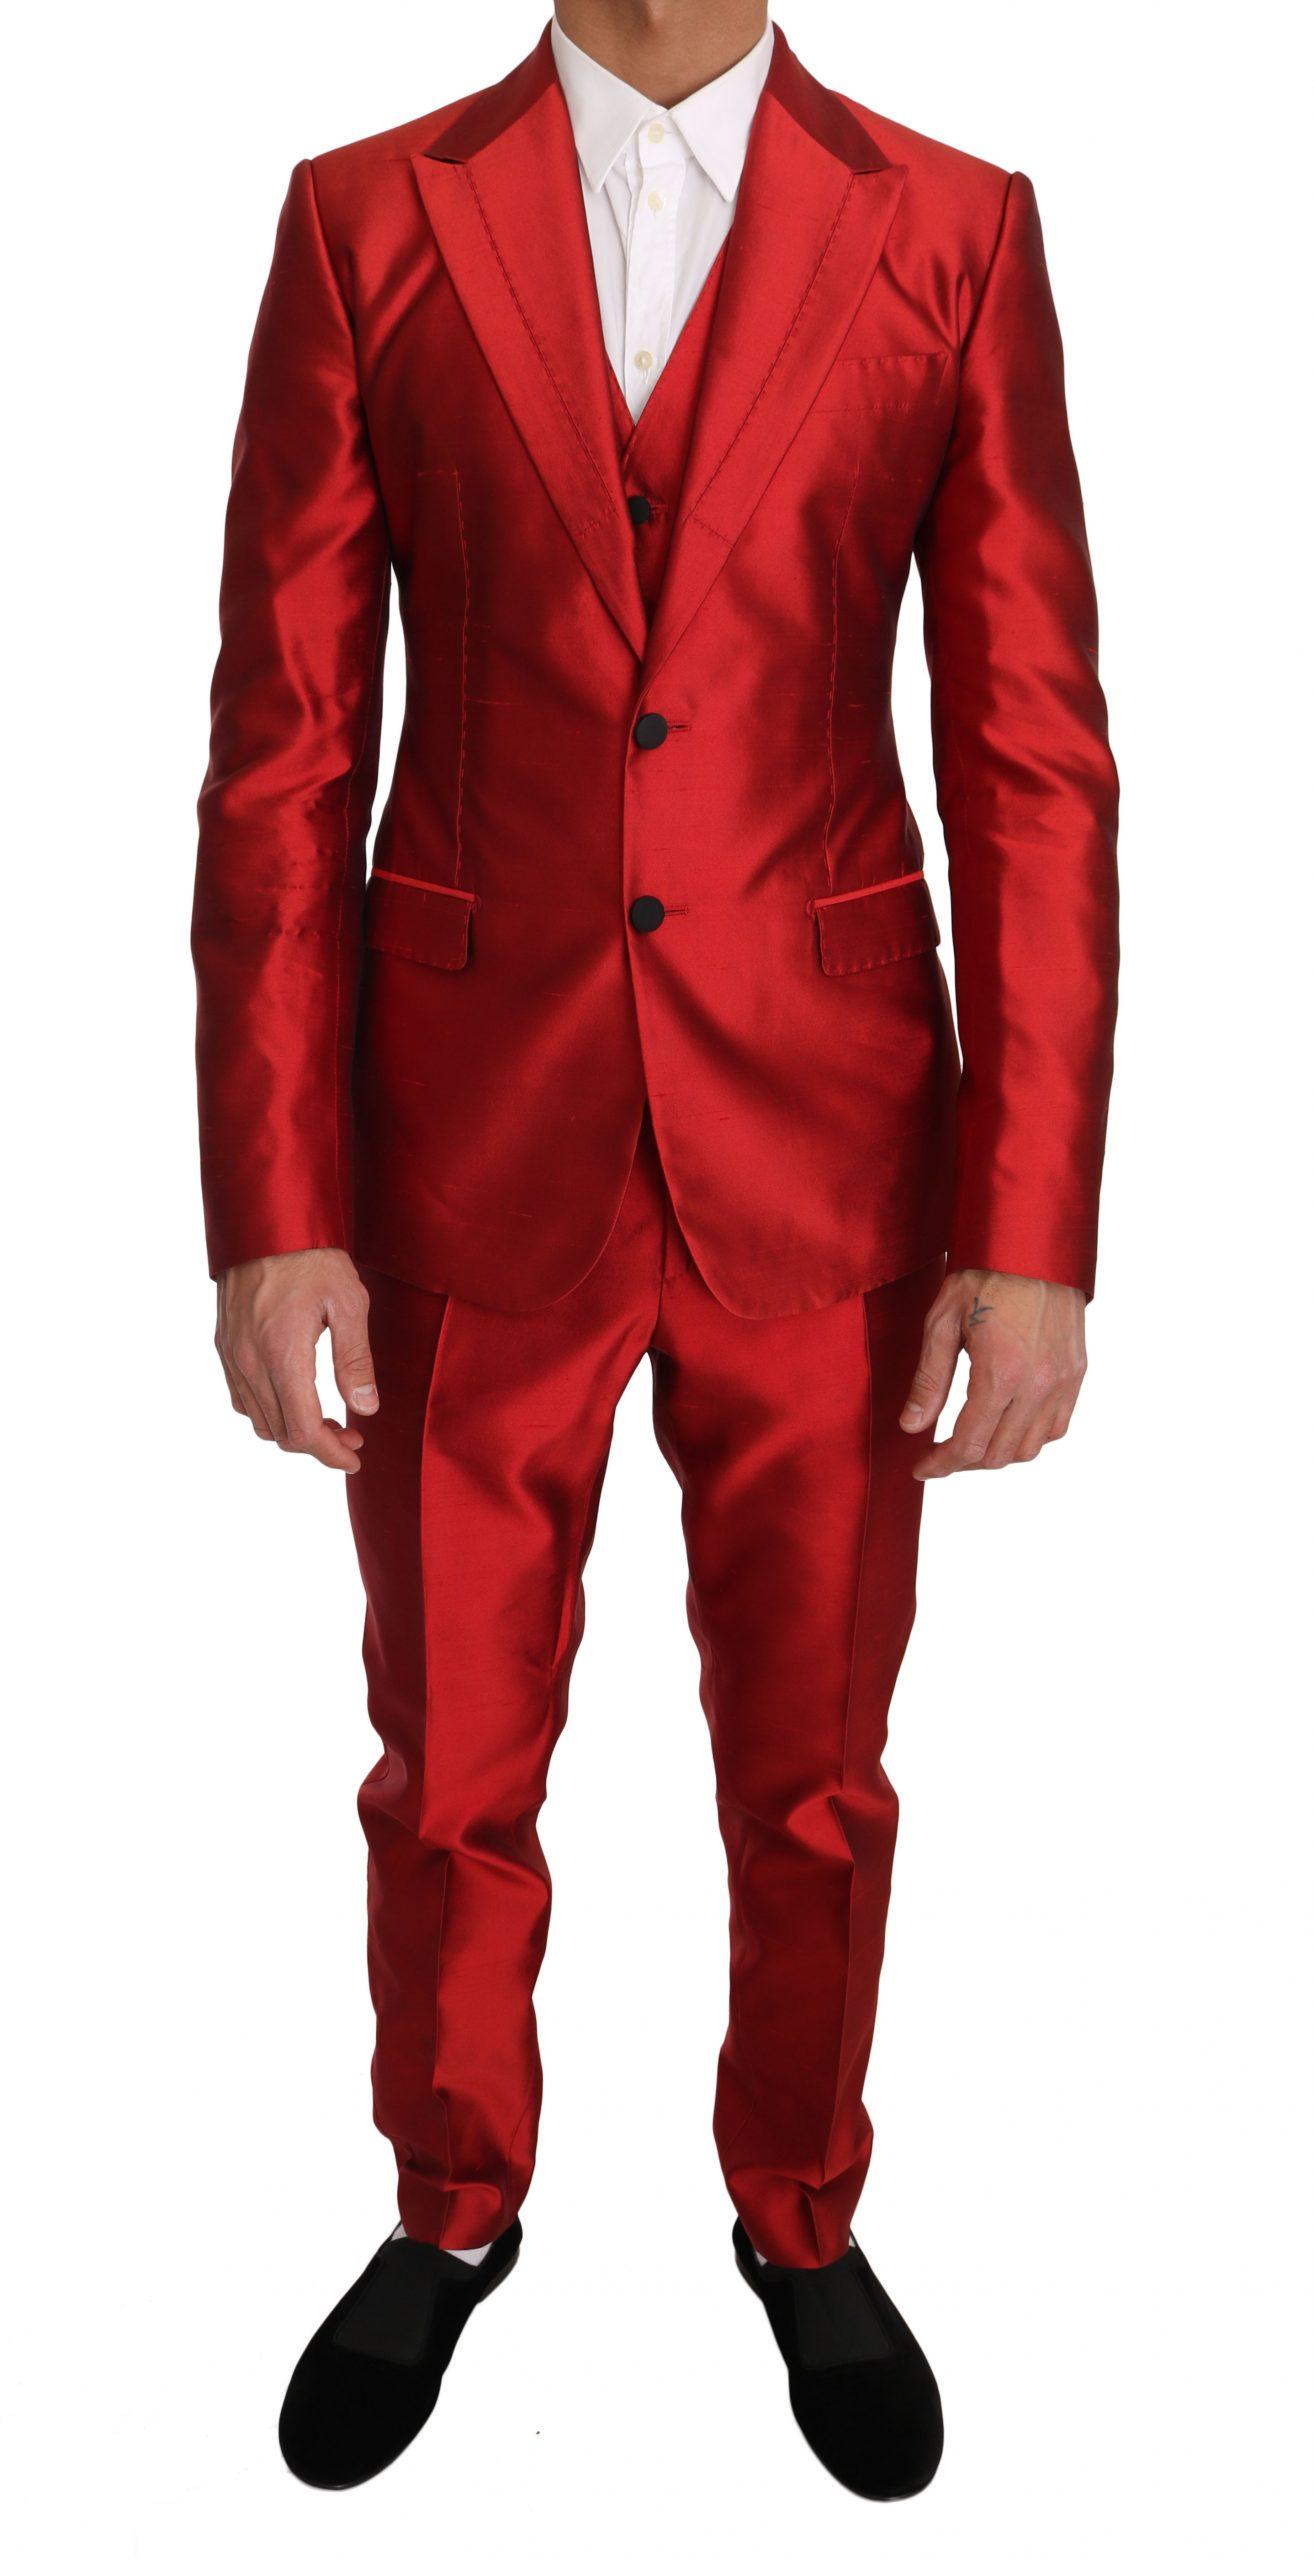 Dolce & Gabbana Men's Silk Slim Fit 3 Piece Two Button Suit Red KOS1180 - IT48   M